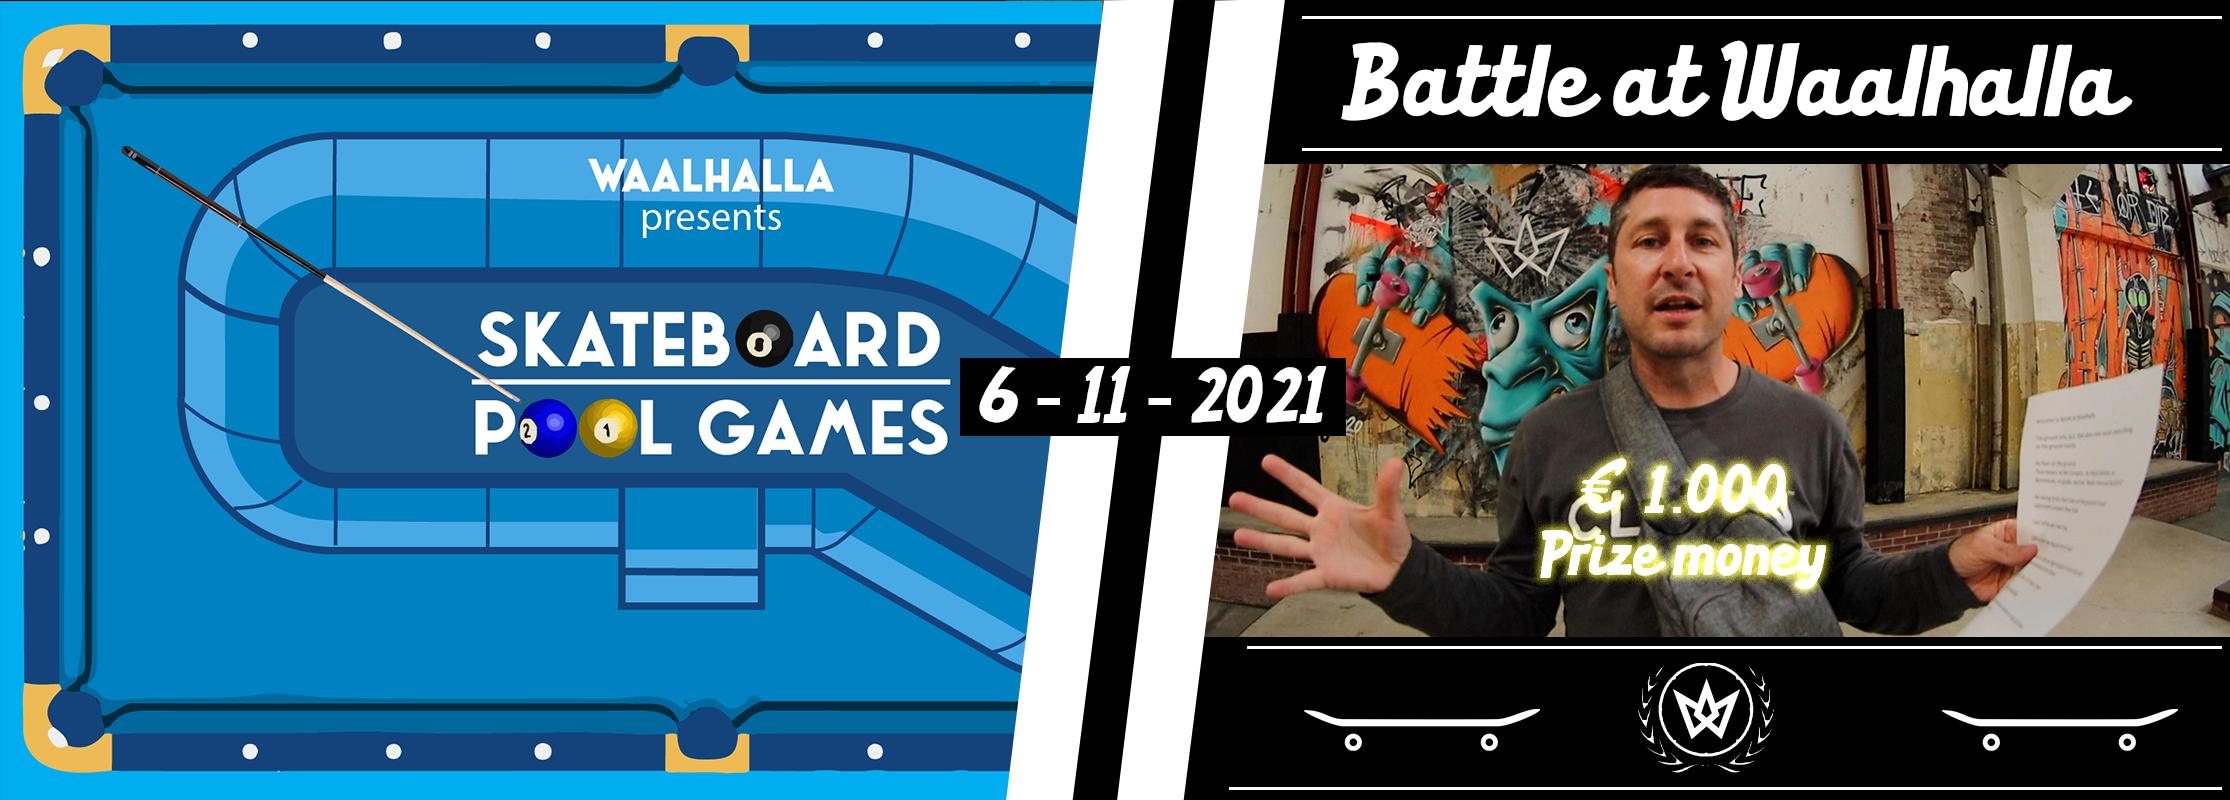 Pool games // Battle at Waalhalla